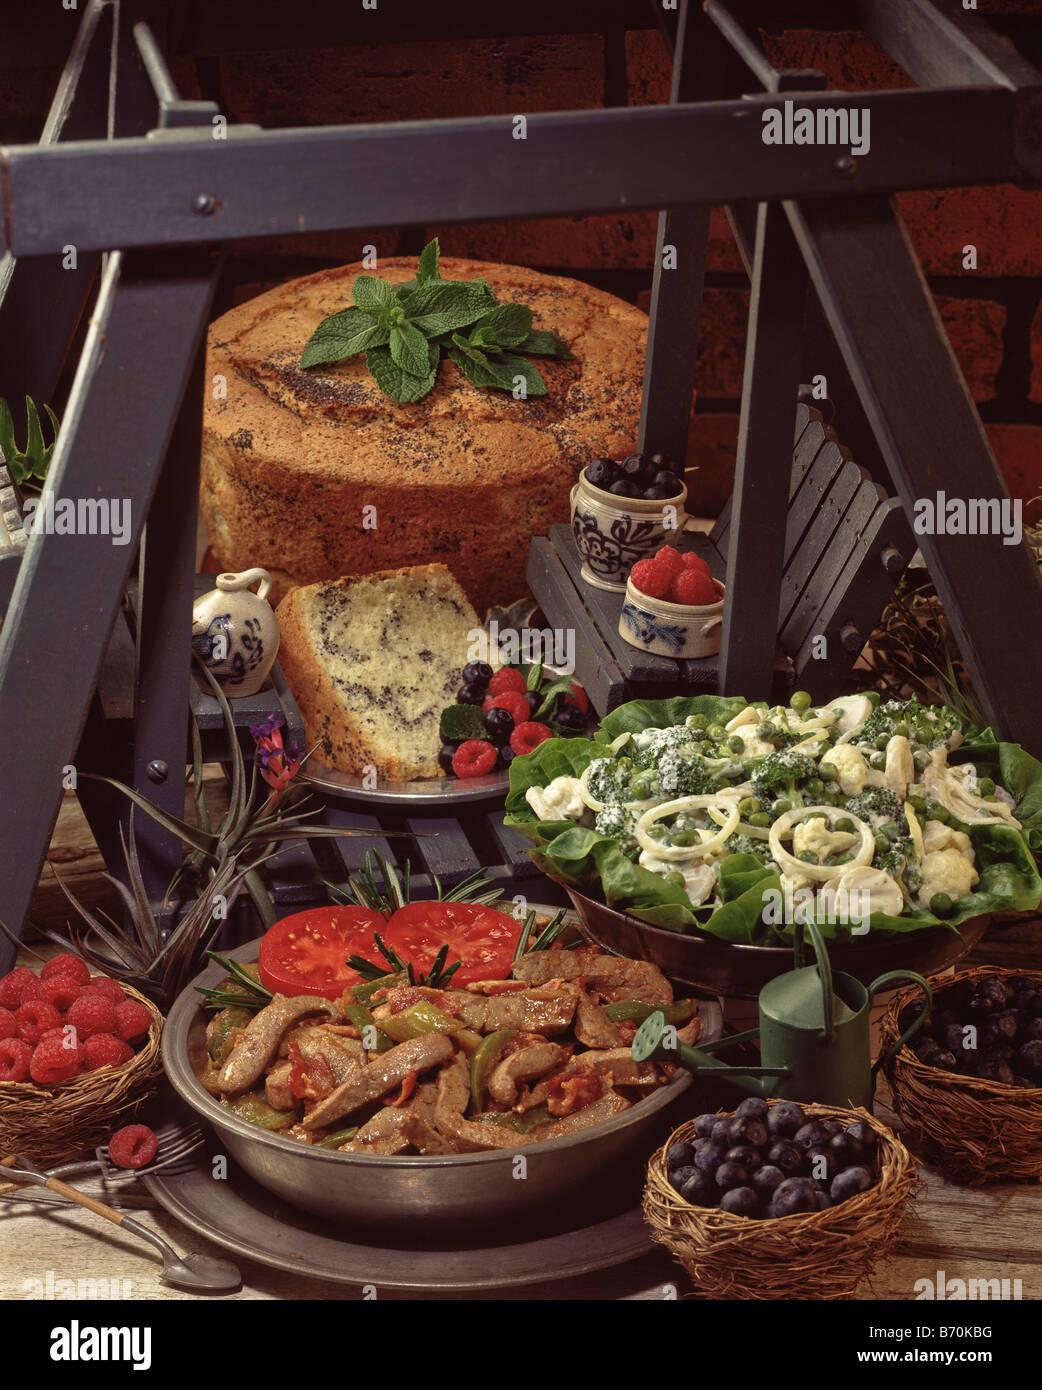 Recipes, cauliflower & broccoli salad, liver you'll love, poppy seed swirl chiffon cake dessert vegetable - Stock Image